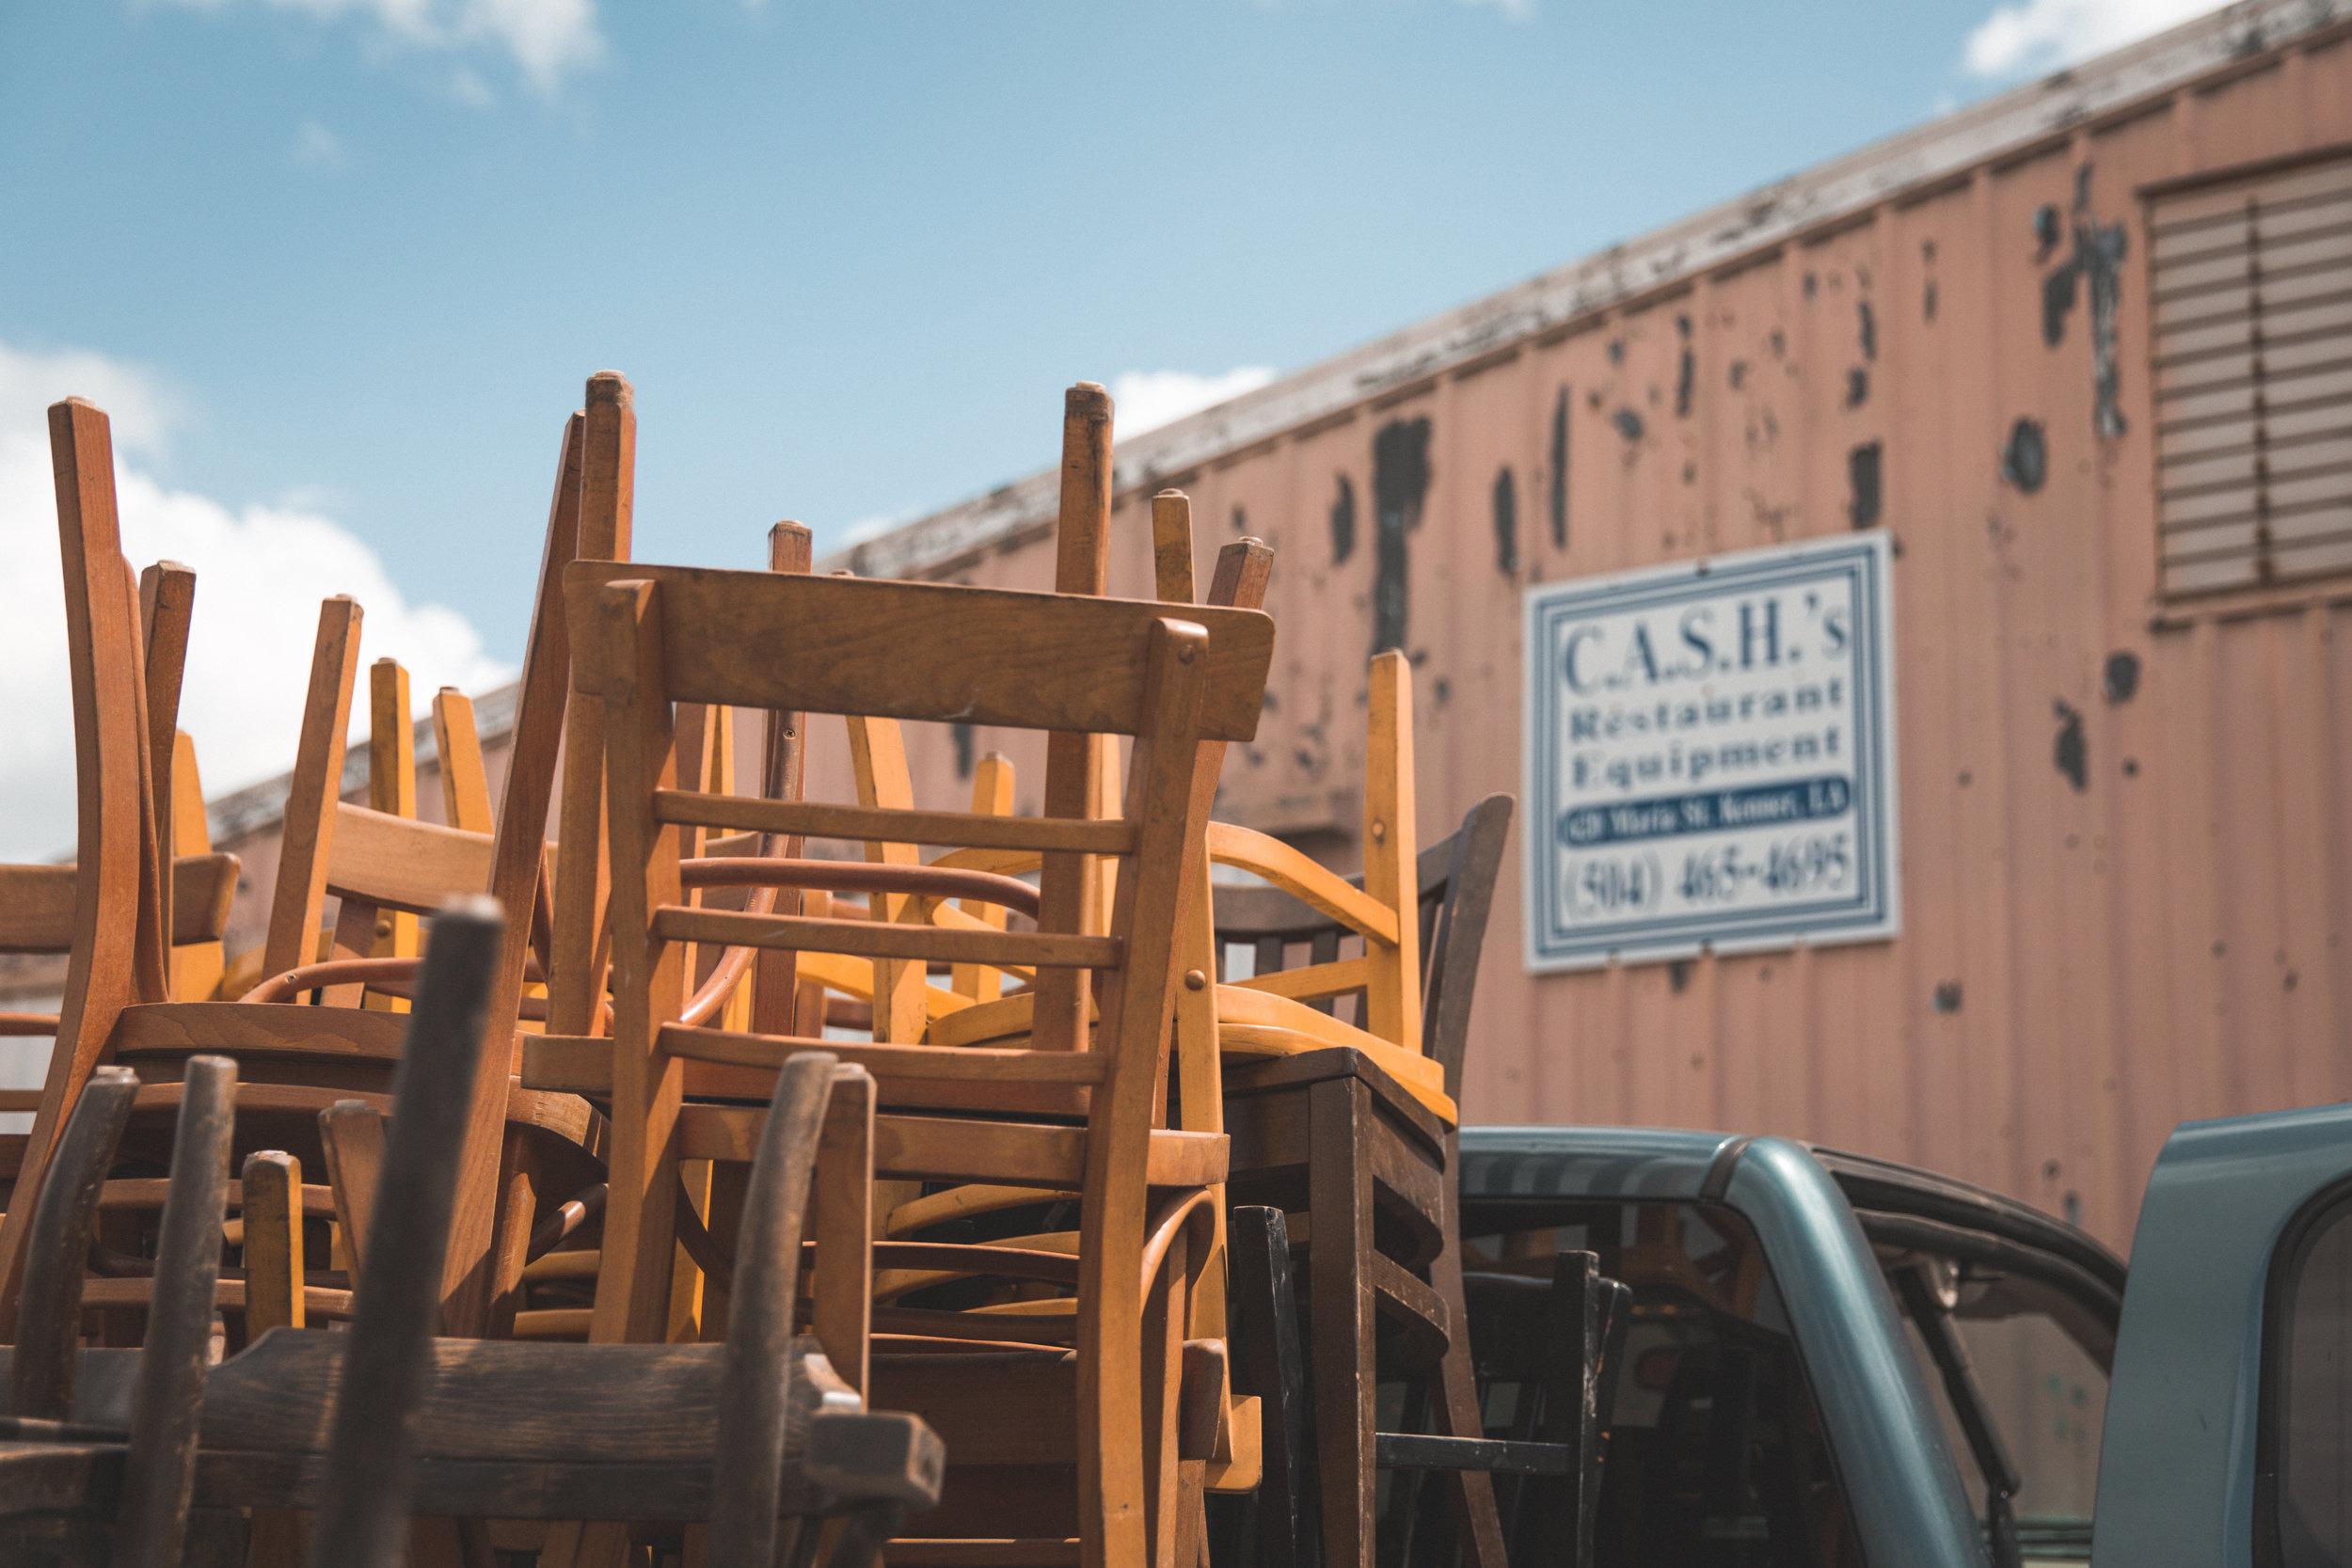 Miel Brewery_CASHs_chairs diy.jpg